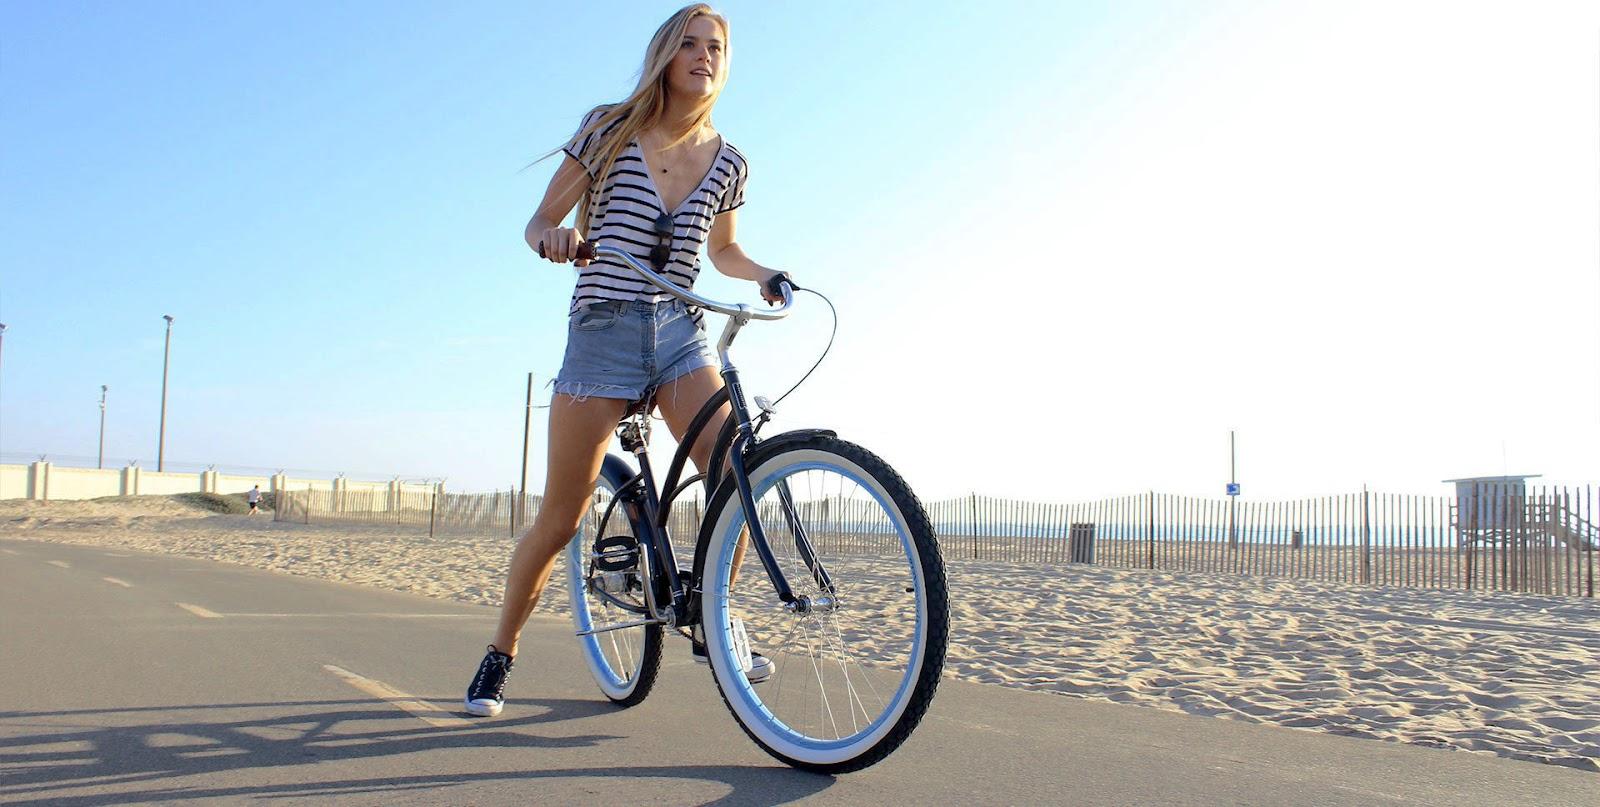 Езда на велосипеде - Youslim.online